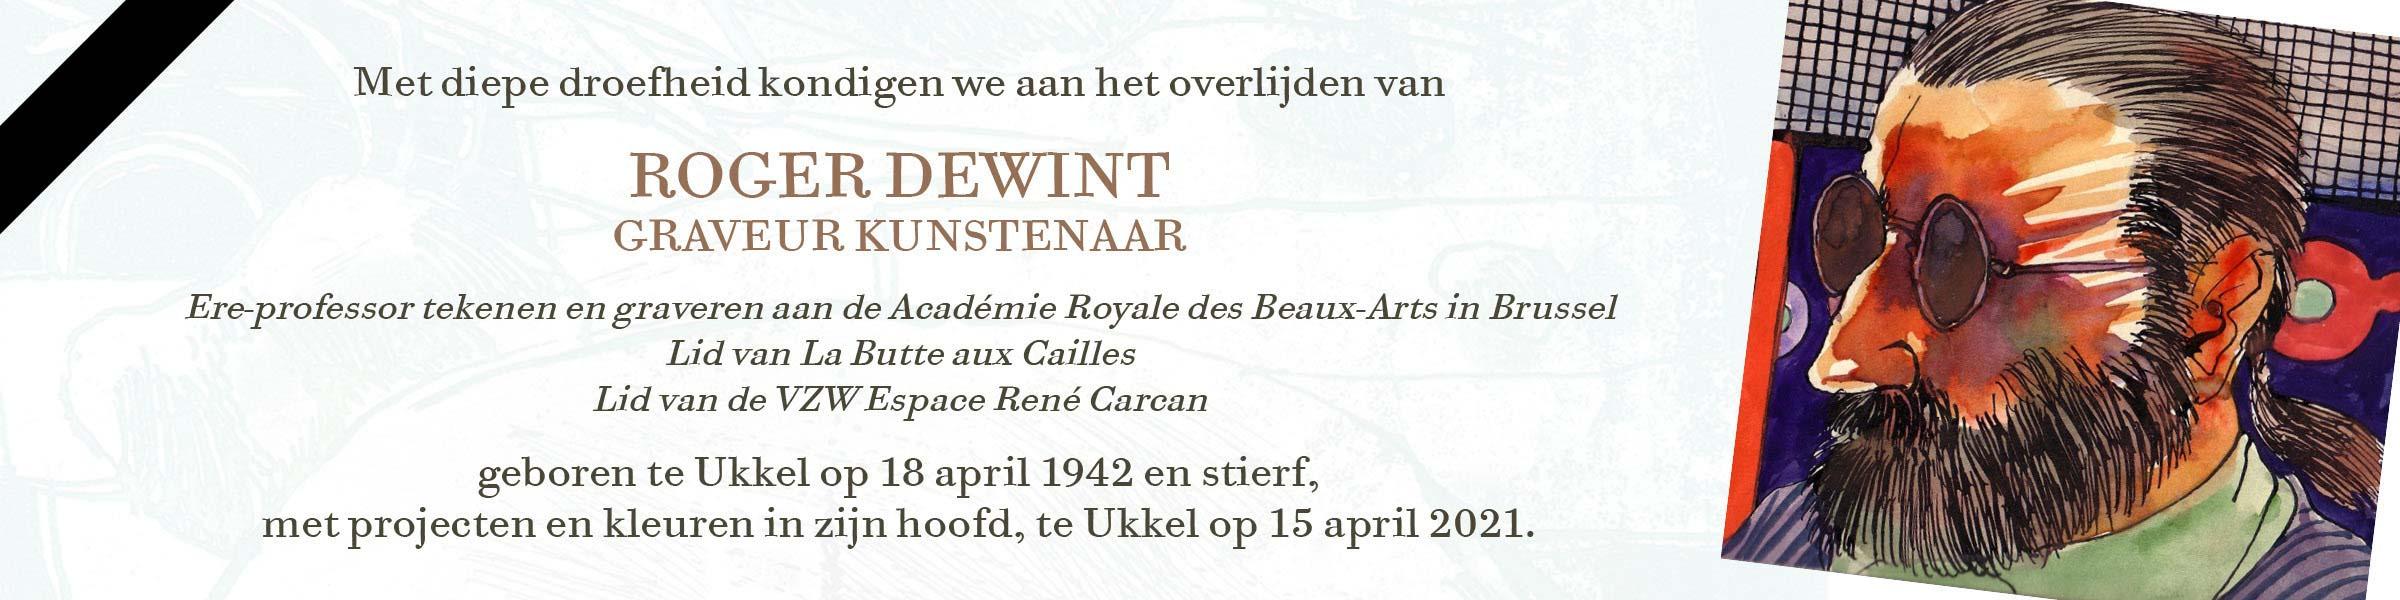 Roger Dewint